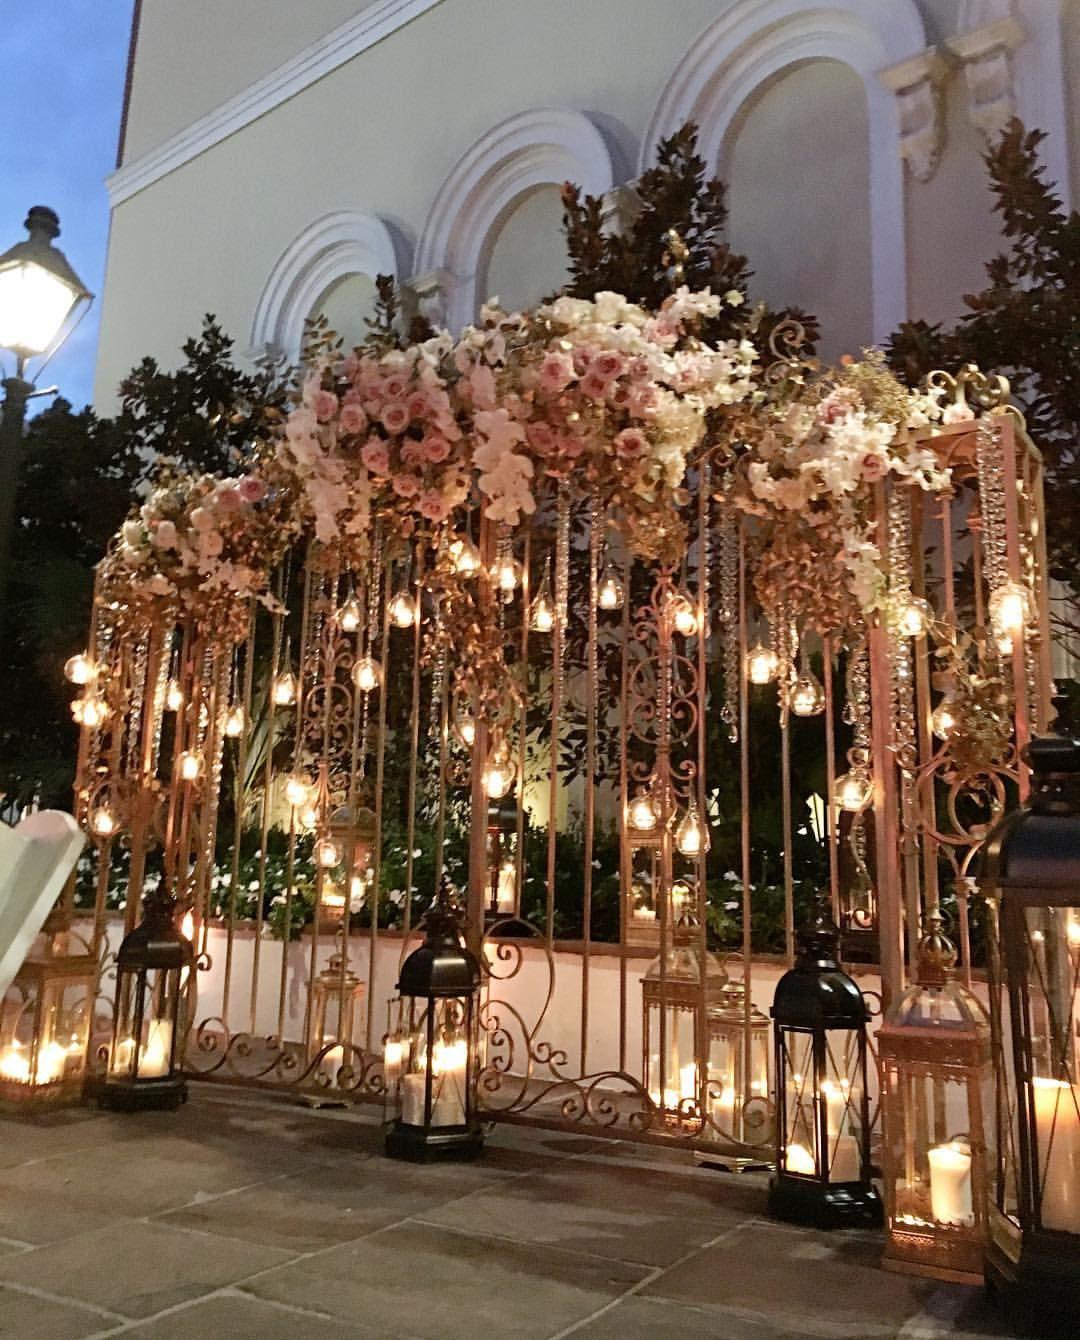 Wedding entry decoration ideas  Pin by Gagankang on wedding deco  Pinterest  Iron gates Backdrops